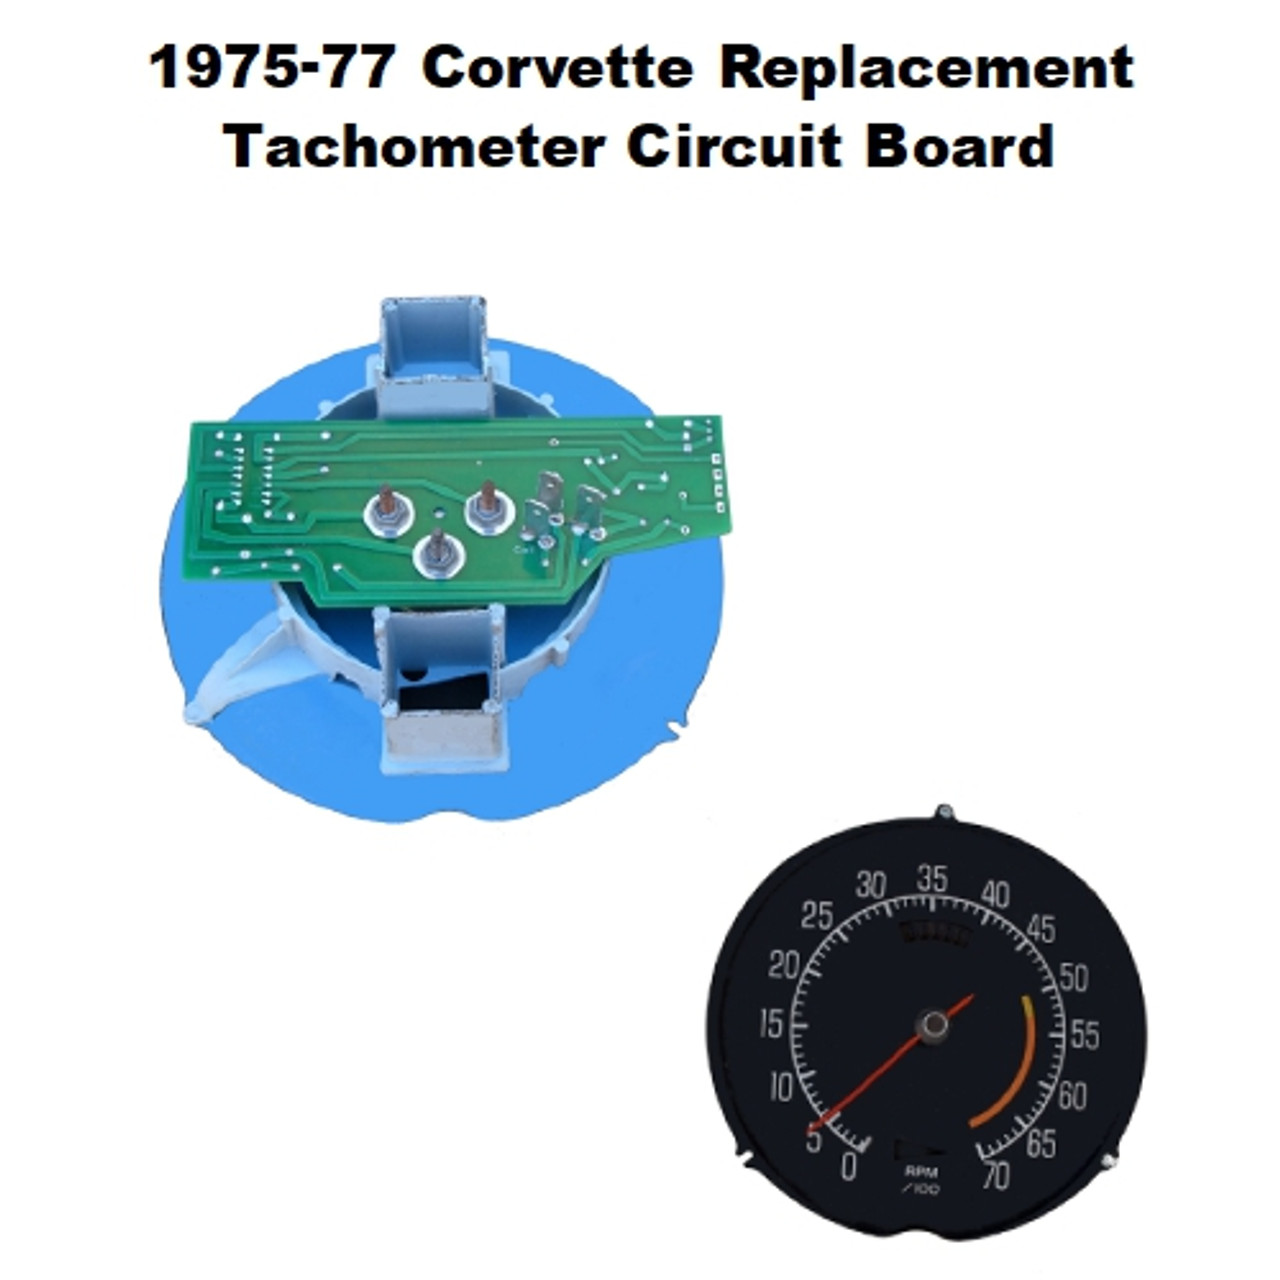 1975-77 Corvette Tachometer Circuit Board - rear